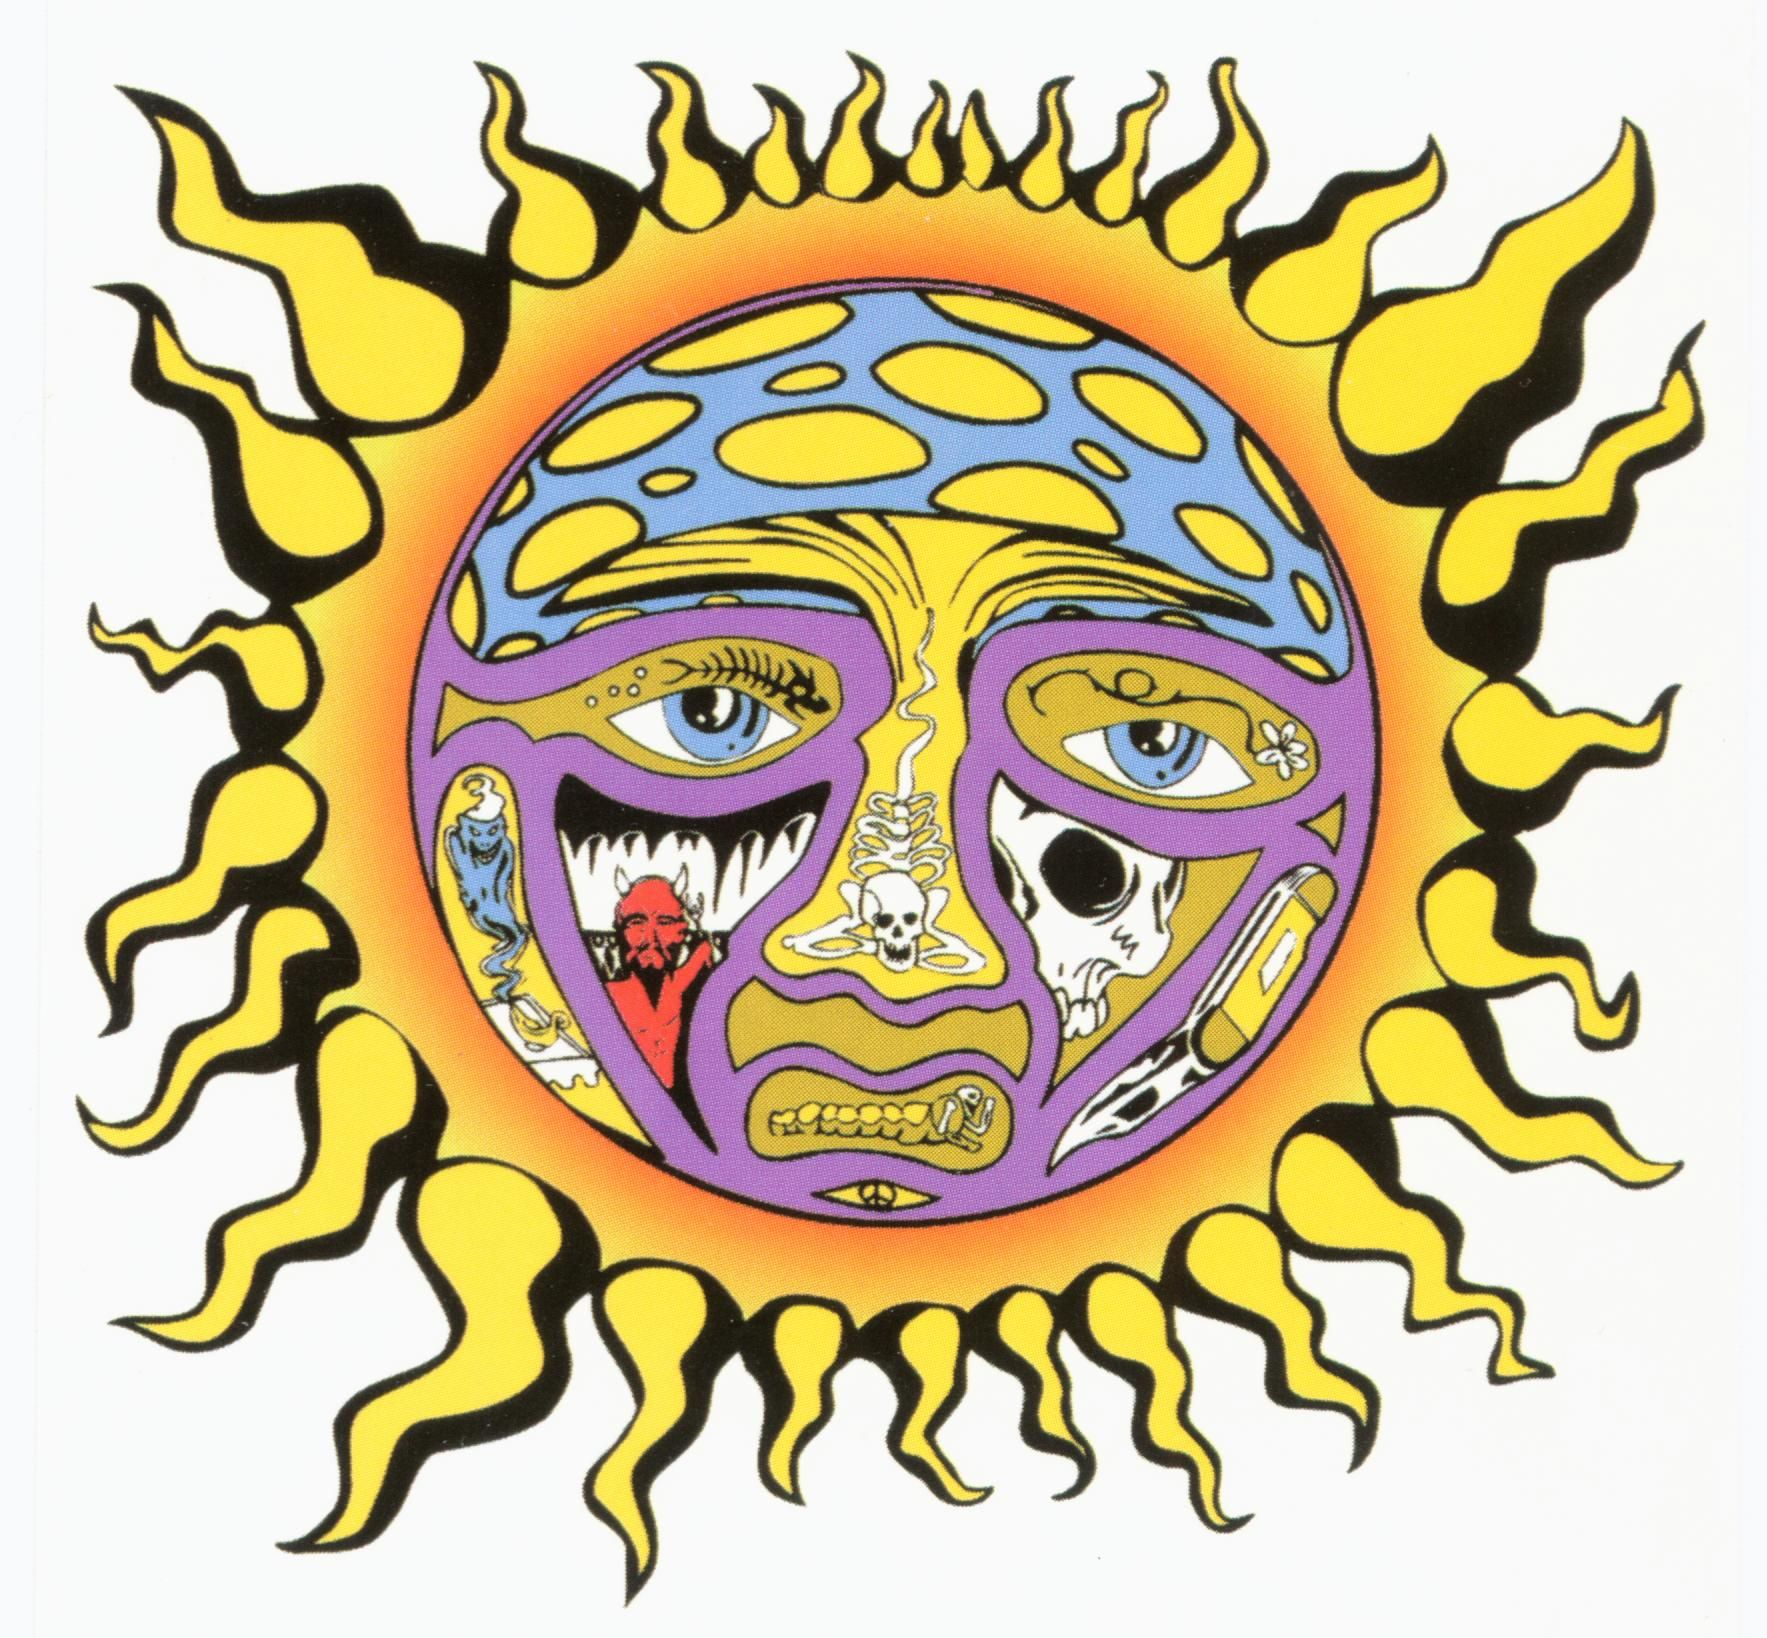 sublime_sun_bigger.jpg (1767×1638) Sublime sun, Art